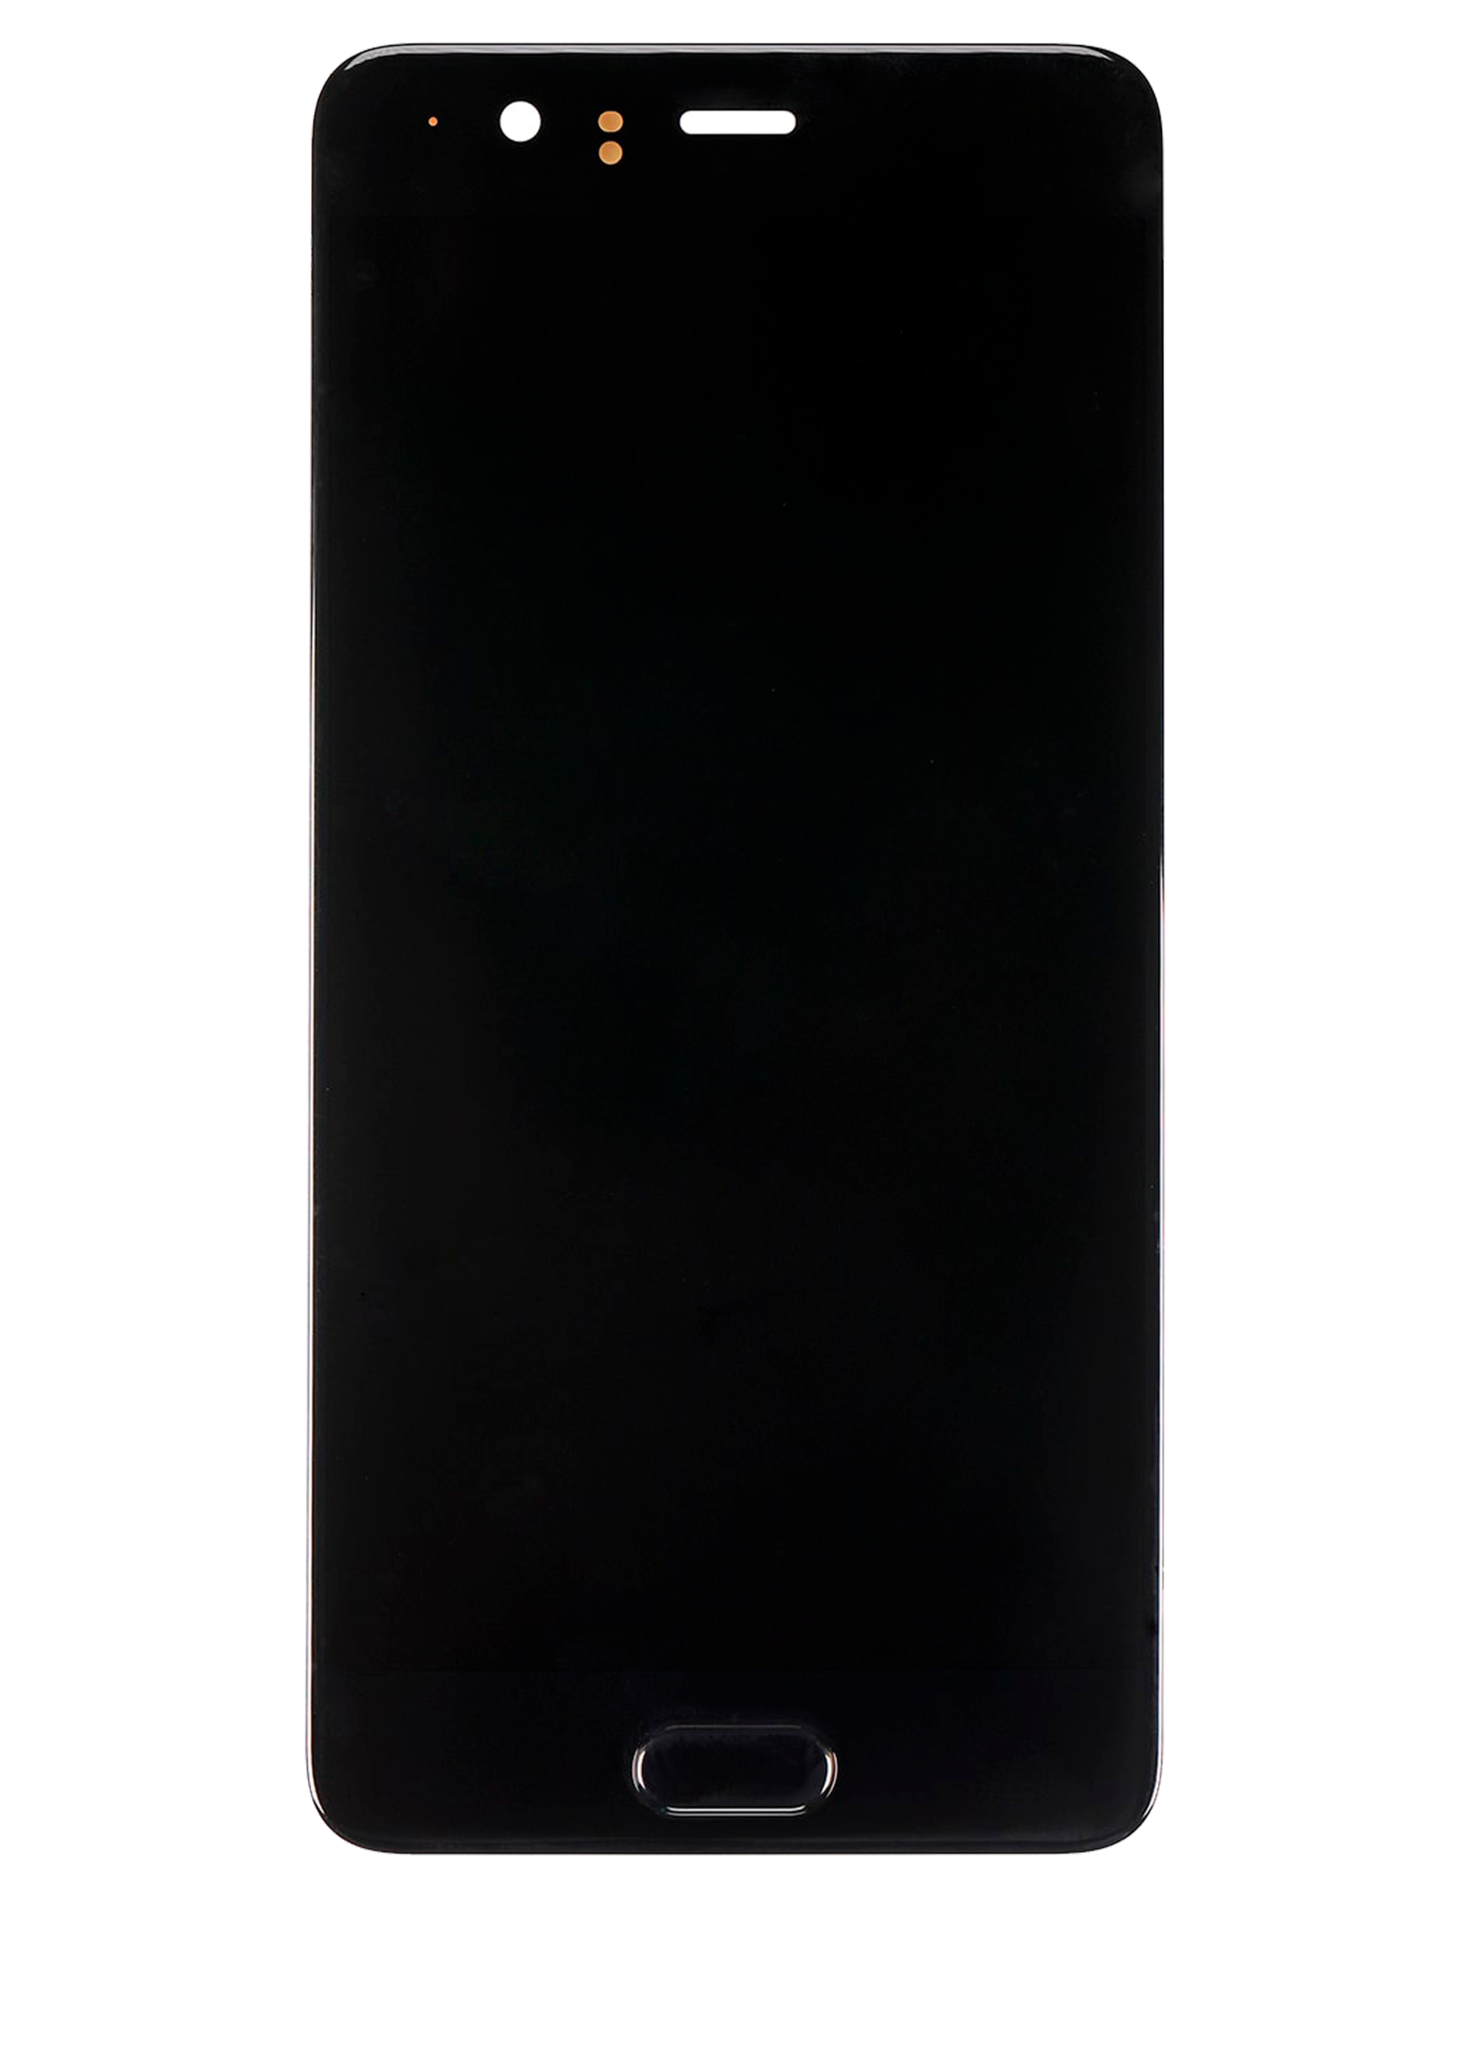 Huawei P10 Plus VKY-L09 Display Module + Frame Black